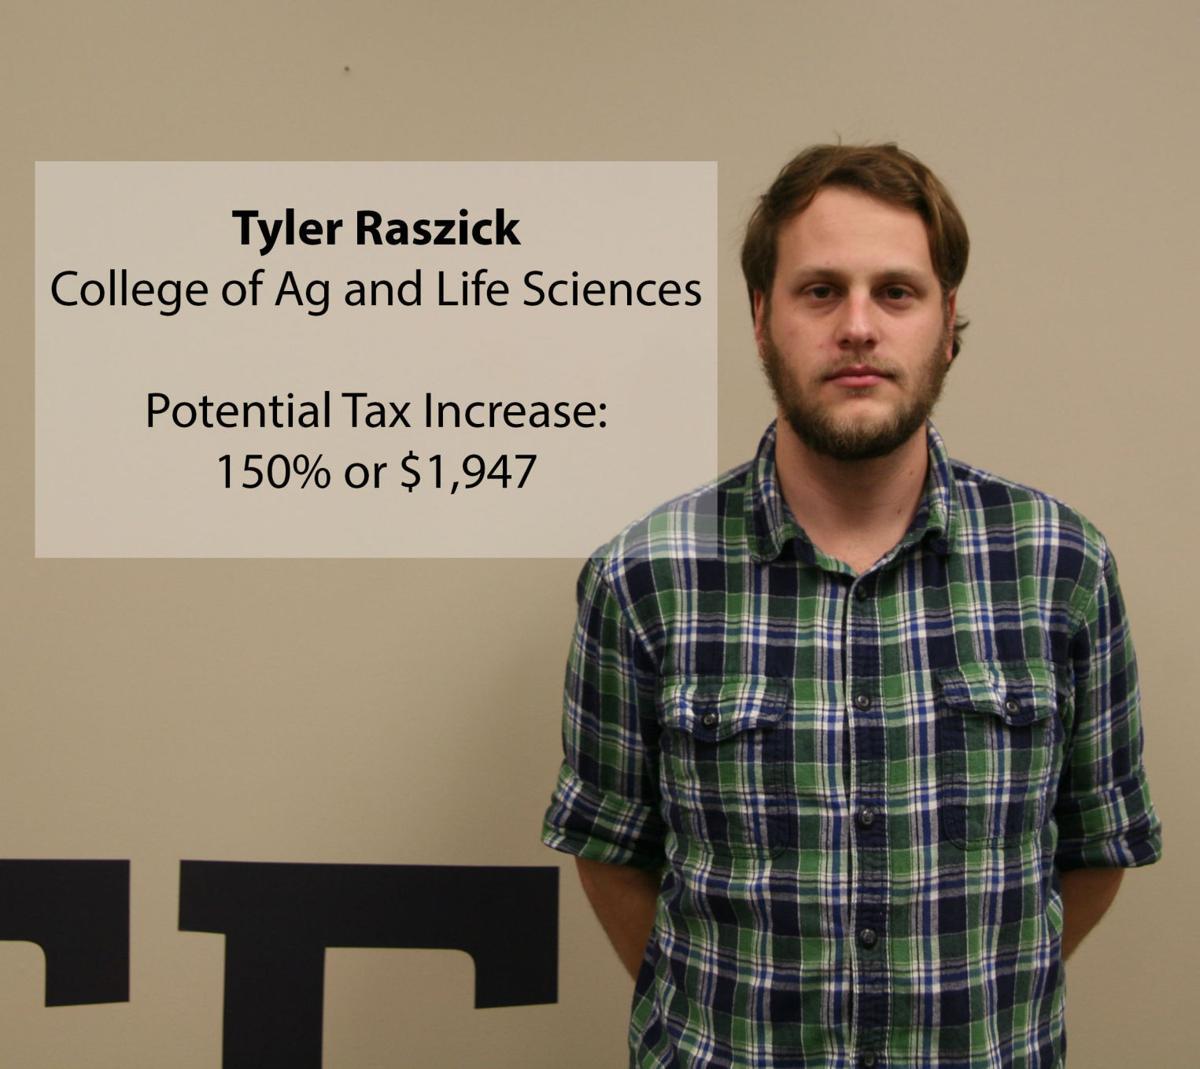 Tyler Raszick